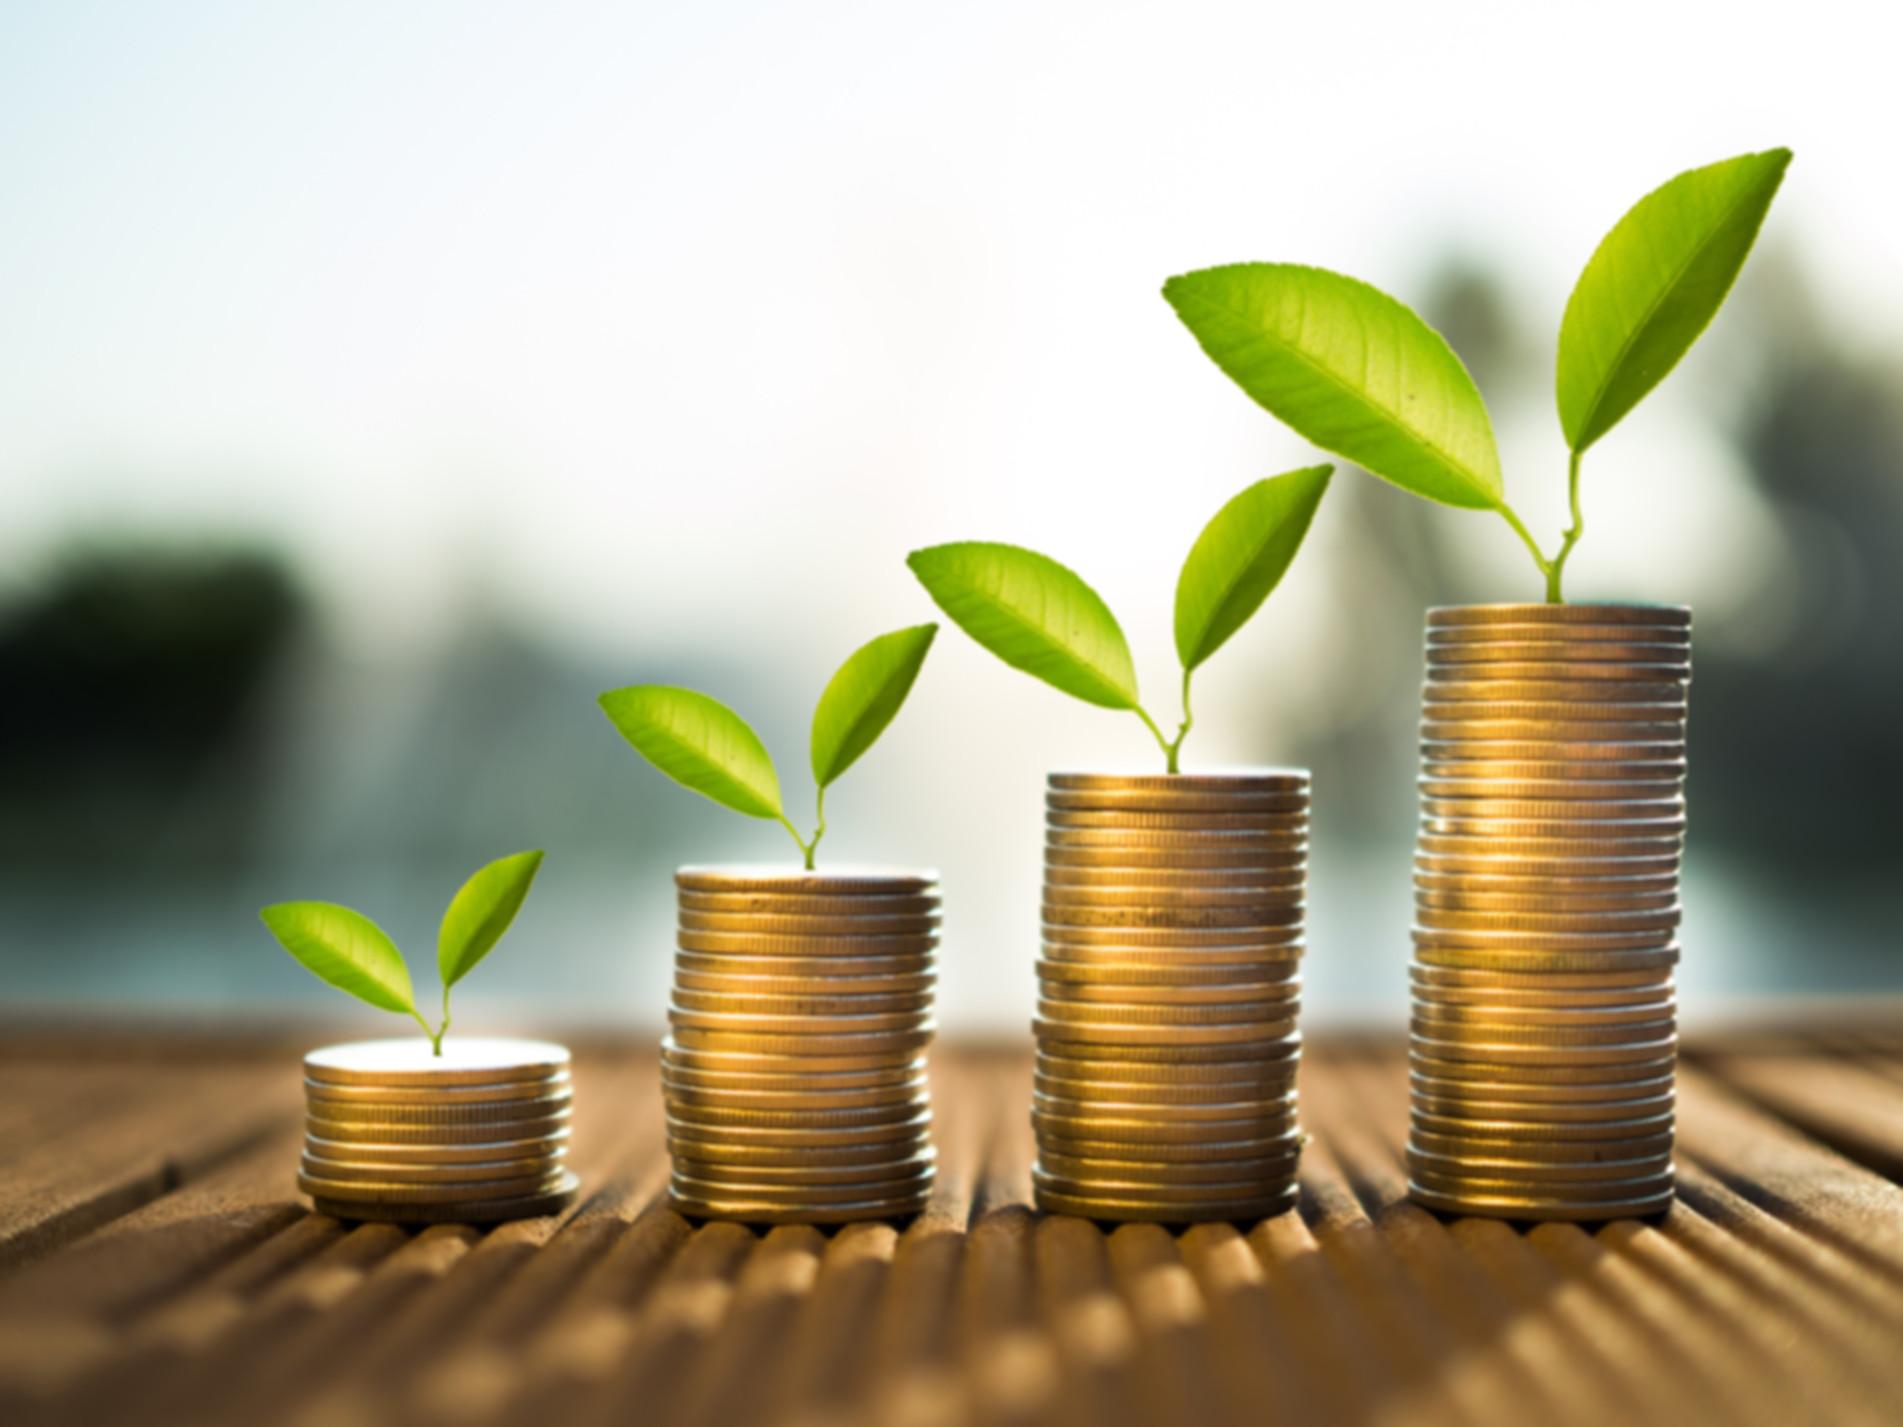 Grow and build wealth based on good advice